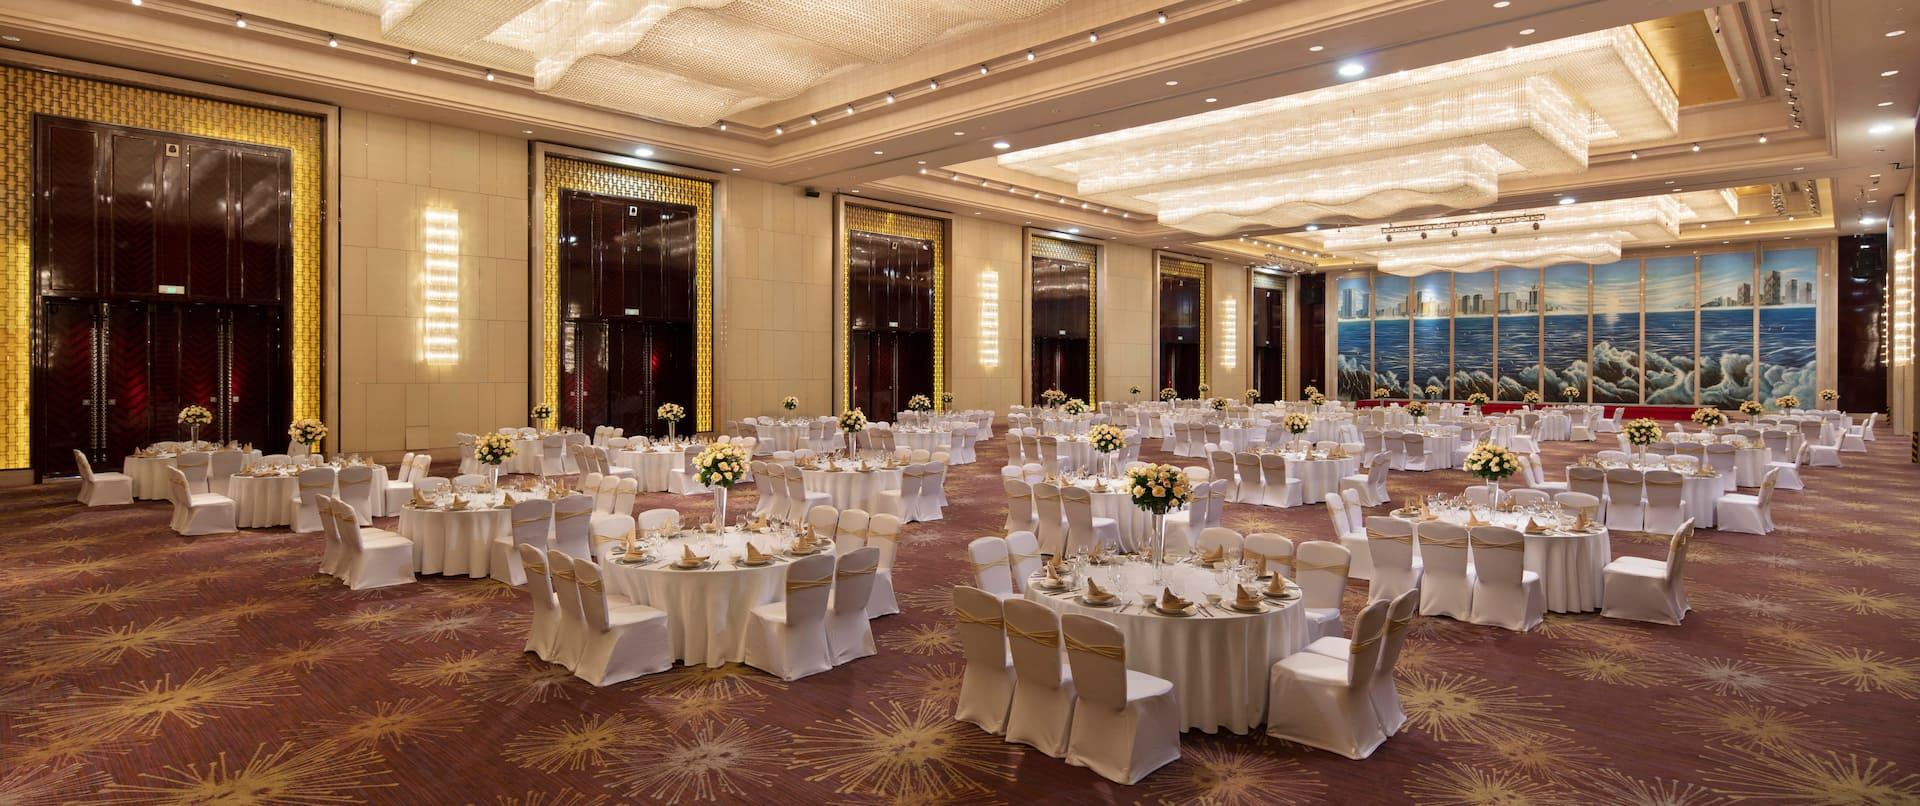 Ballroom Round Table